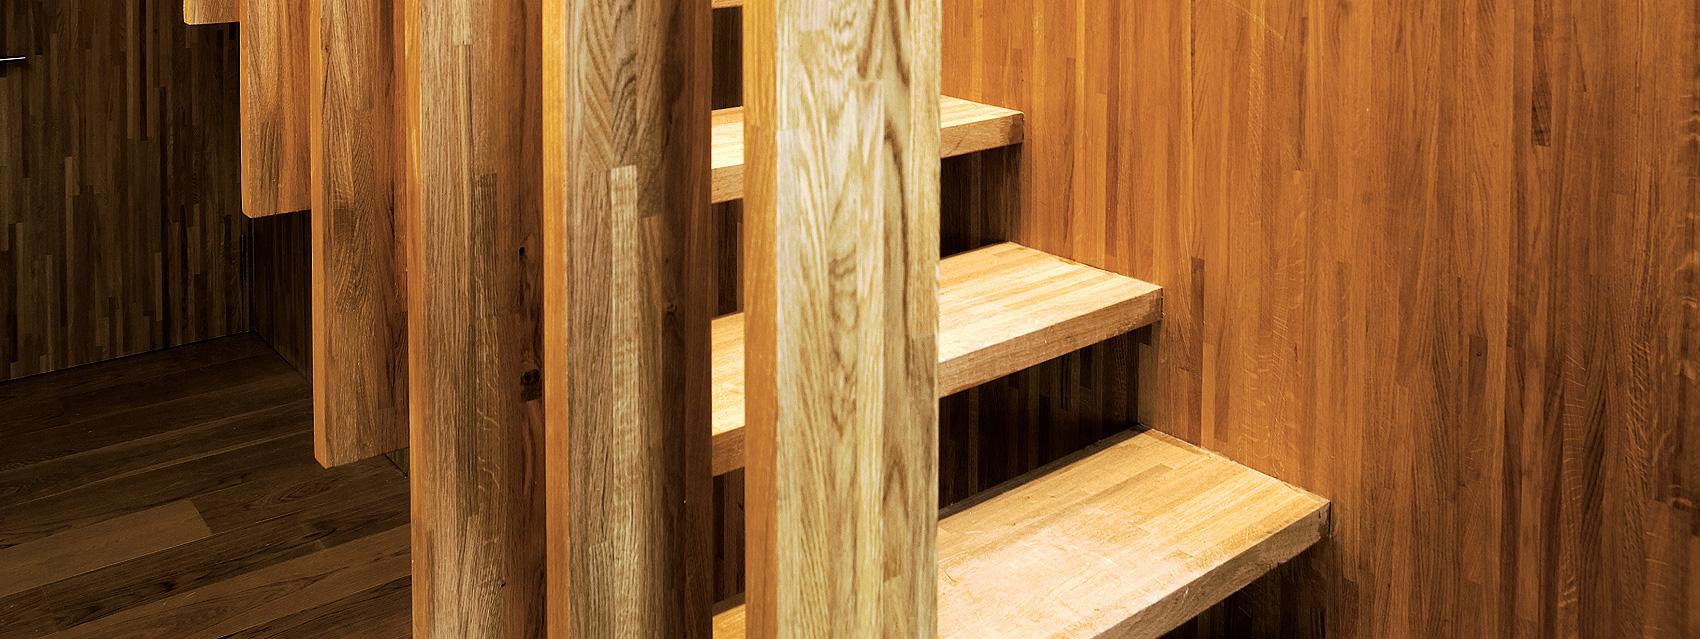 Estructuras de madera maderea - Estructura madera laminada ...